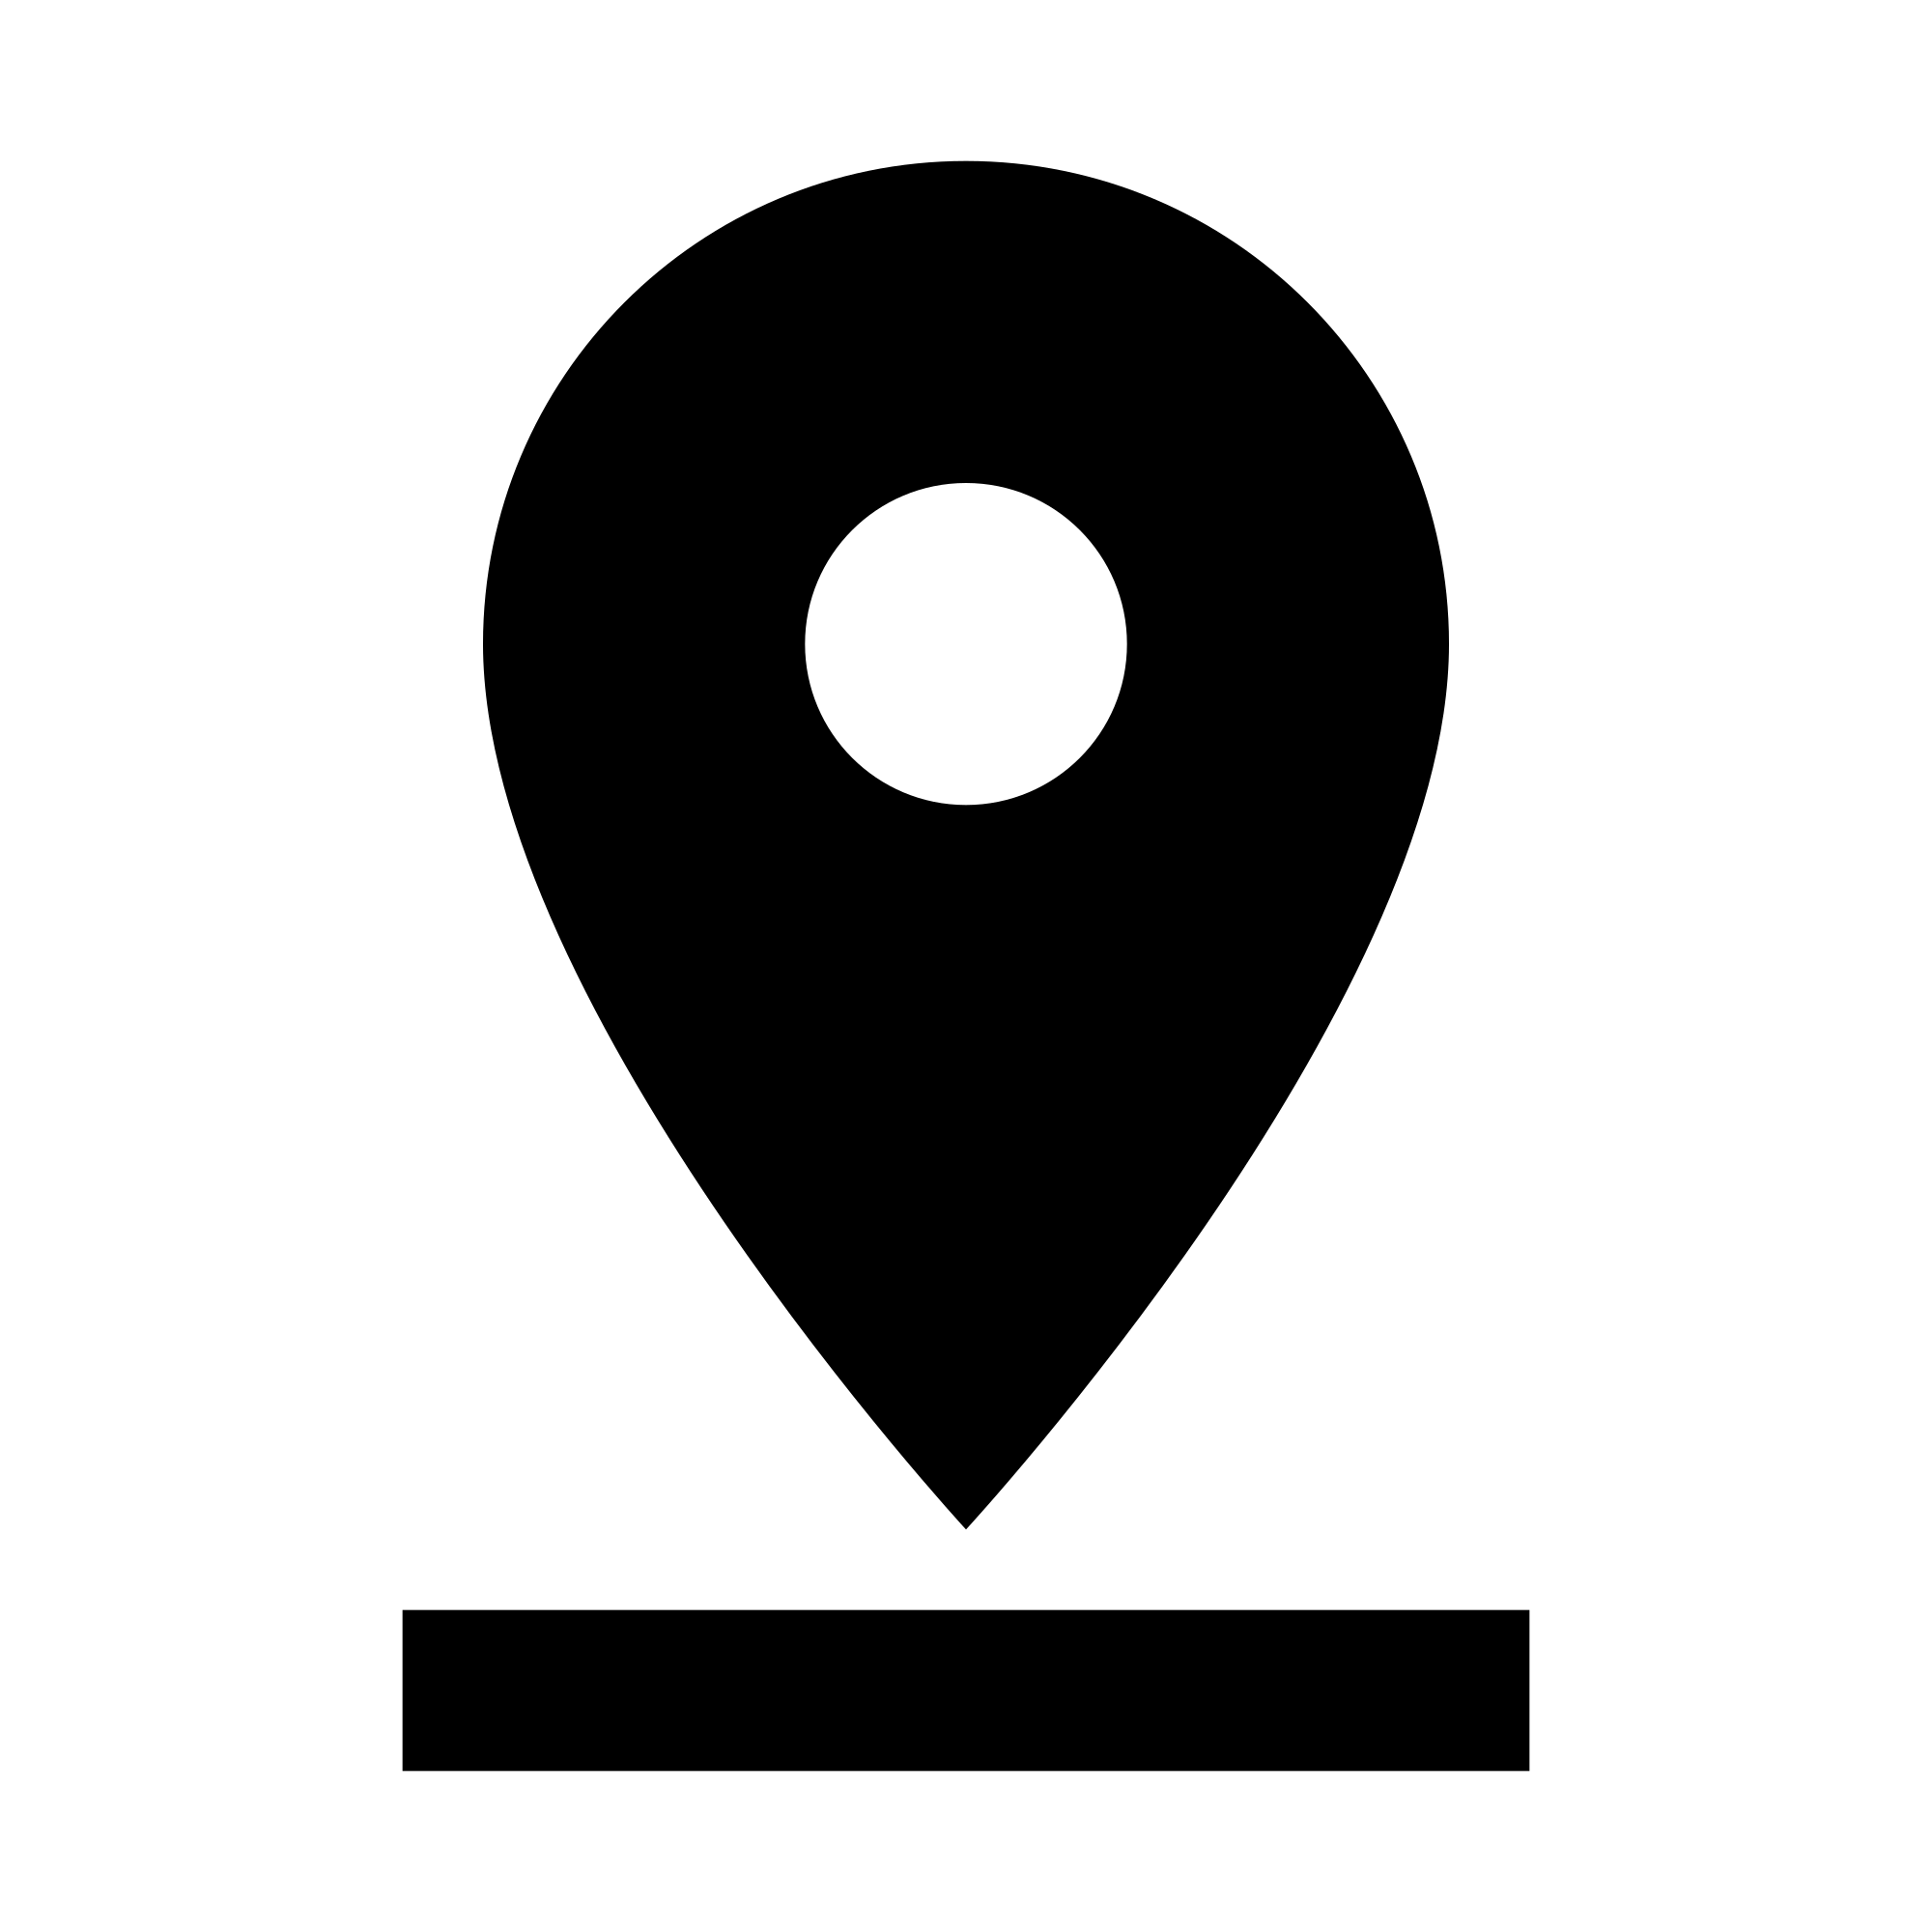 File ic px svg. Pin clipart pin drop